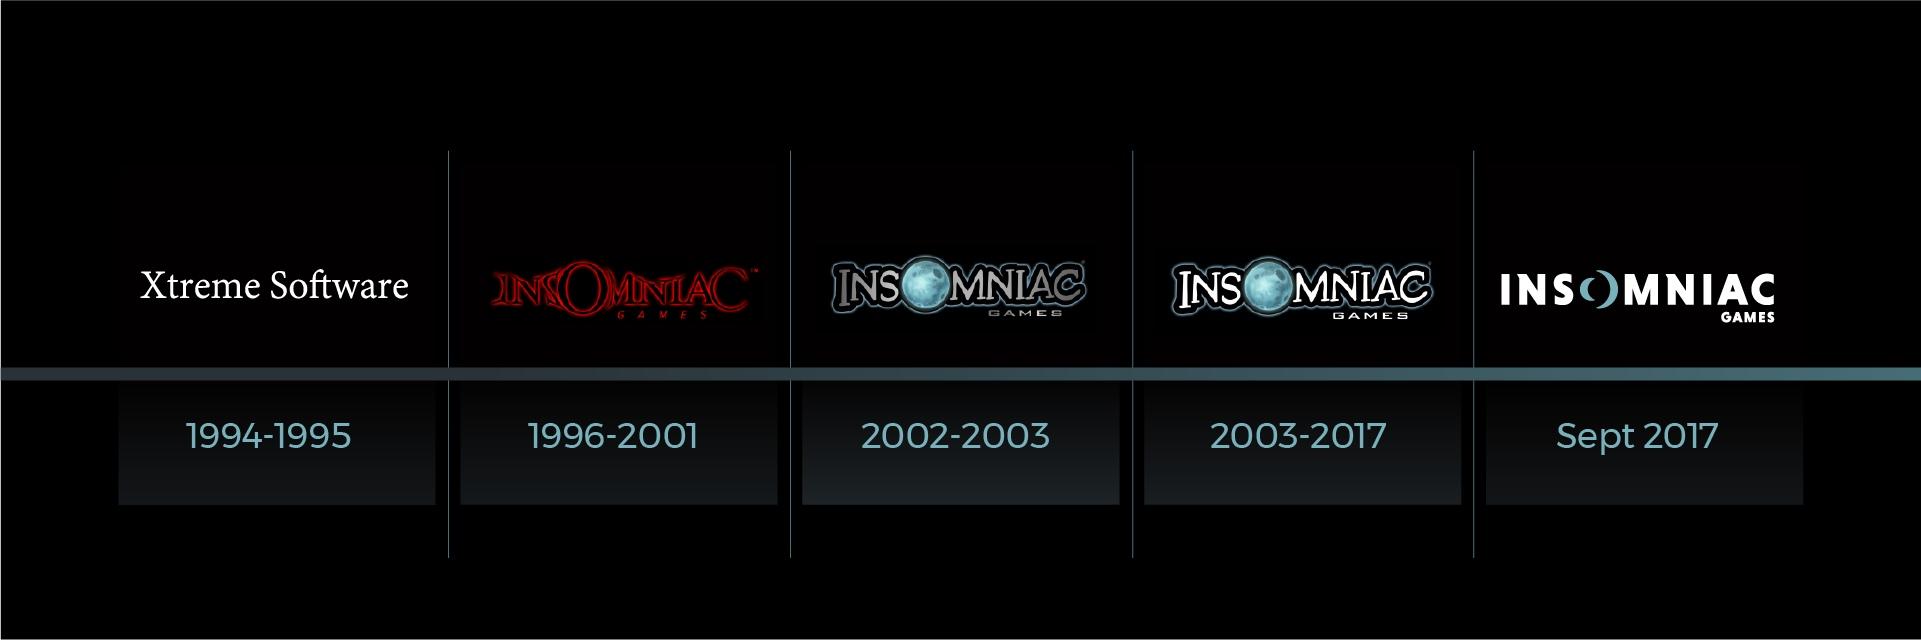 Insomniac Games cambia su logotipo